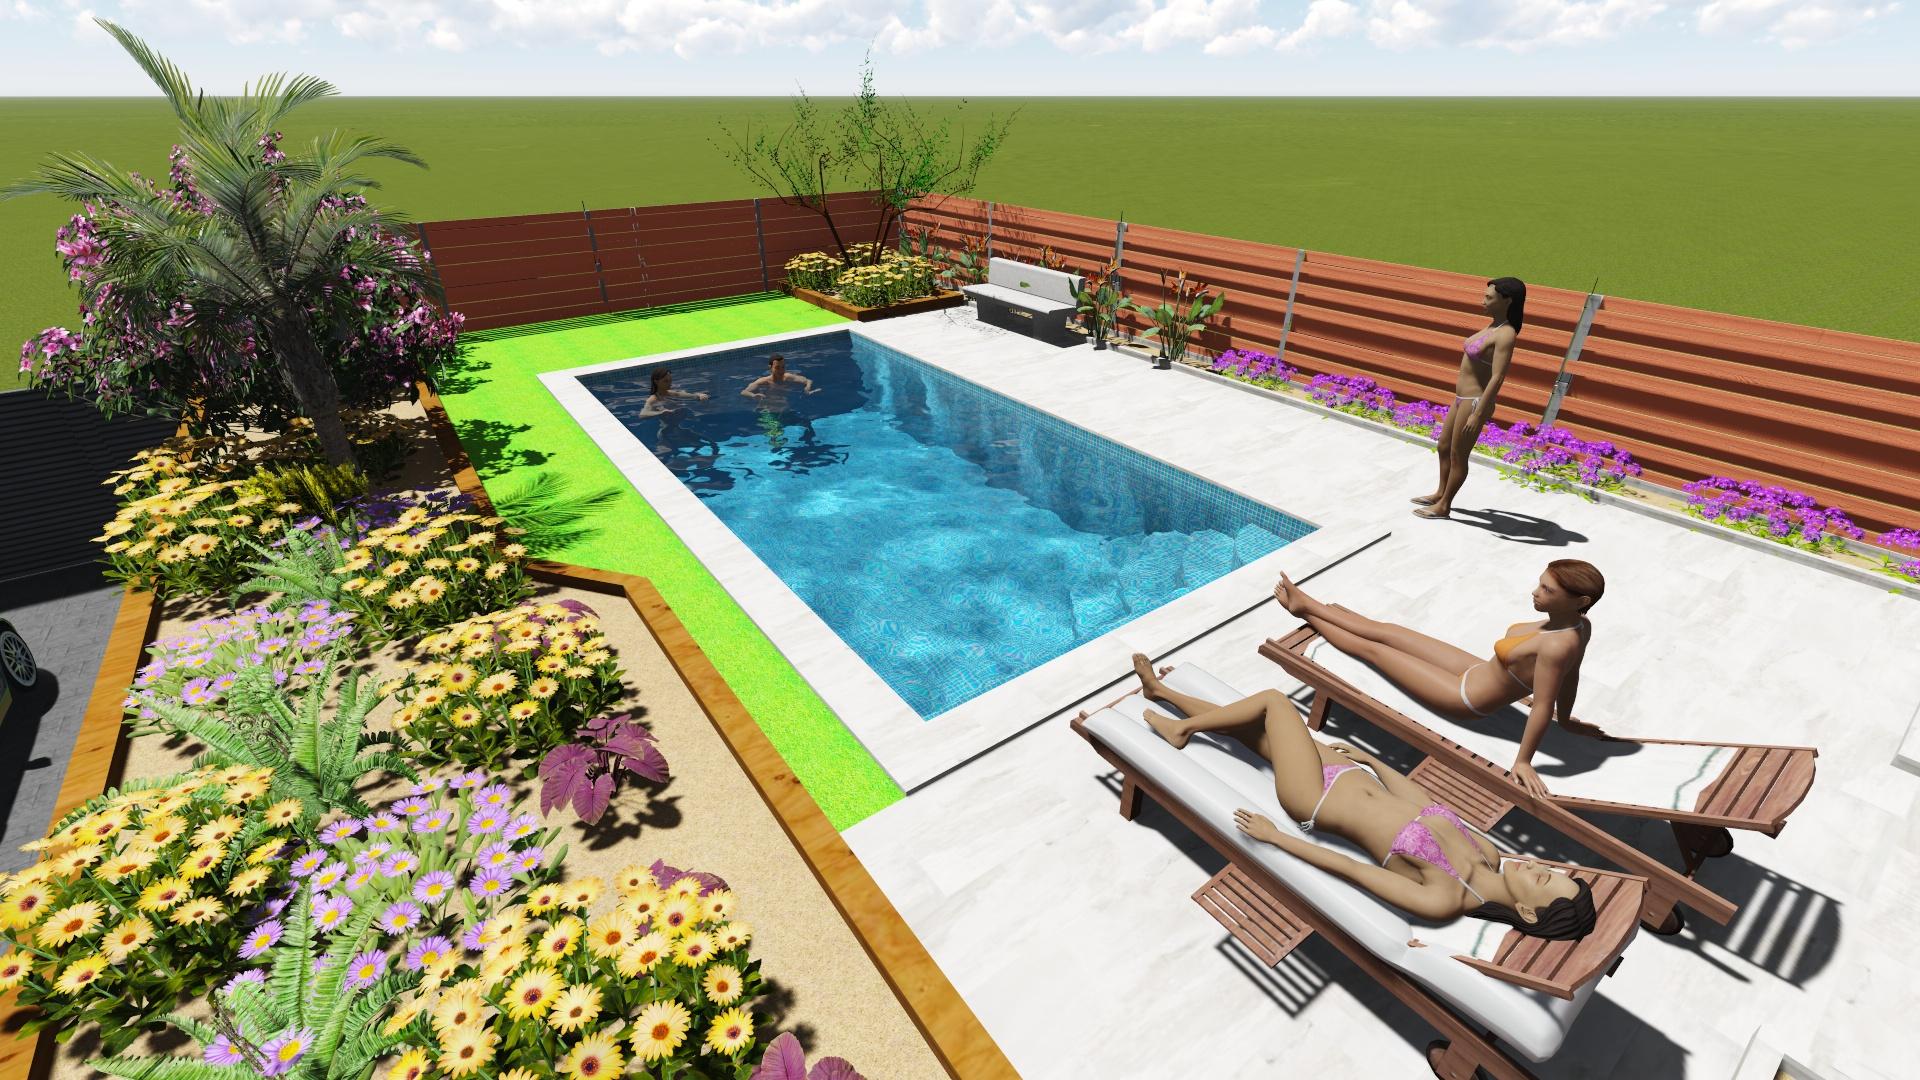 Construcci n de piscinas de obra for Programa diseno de piscinas 3d gratis